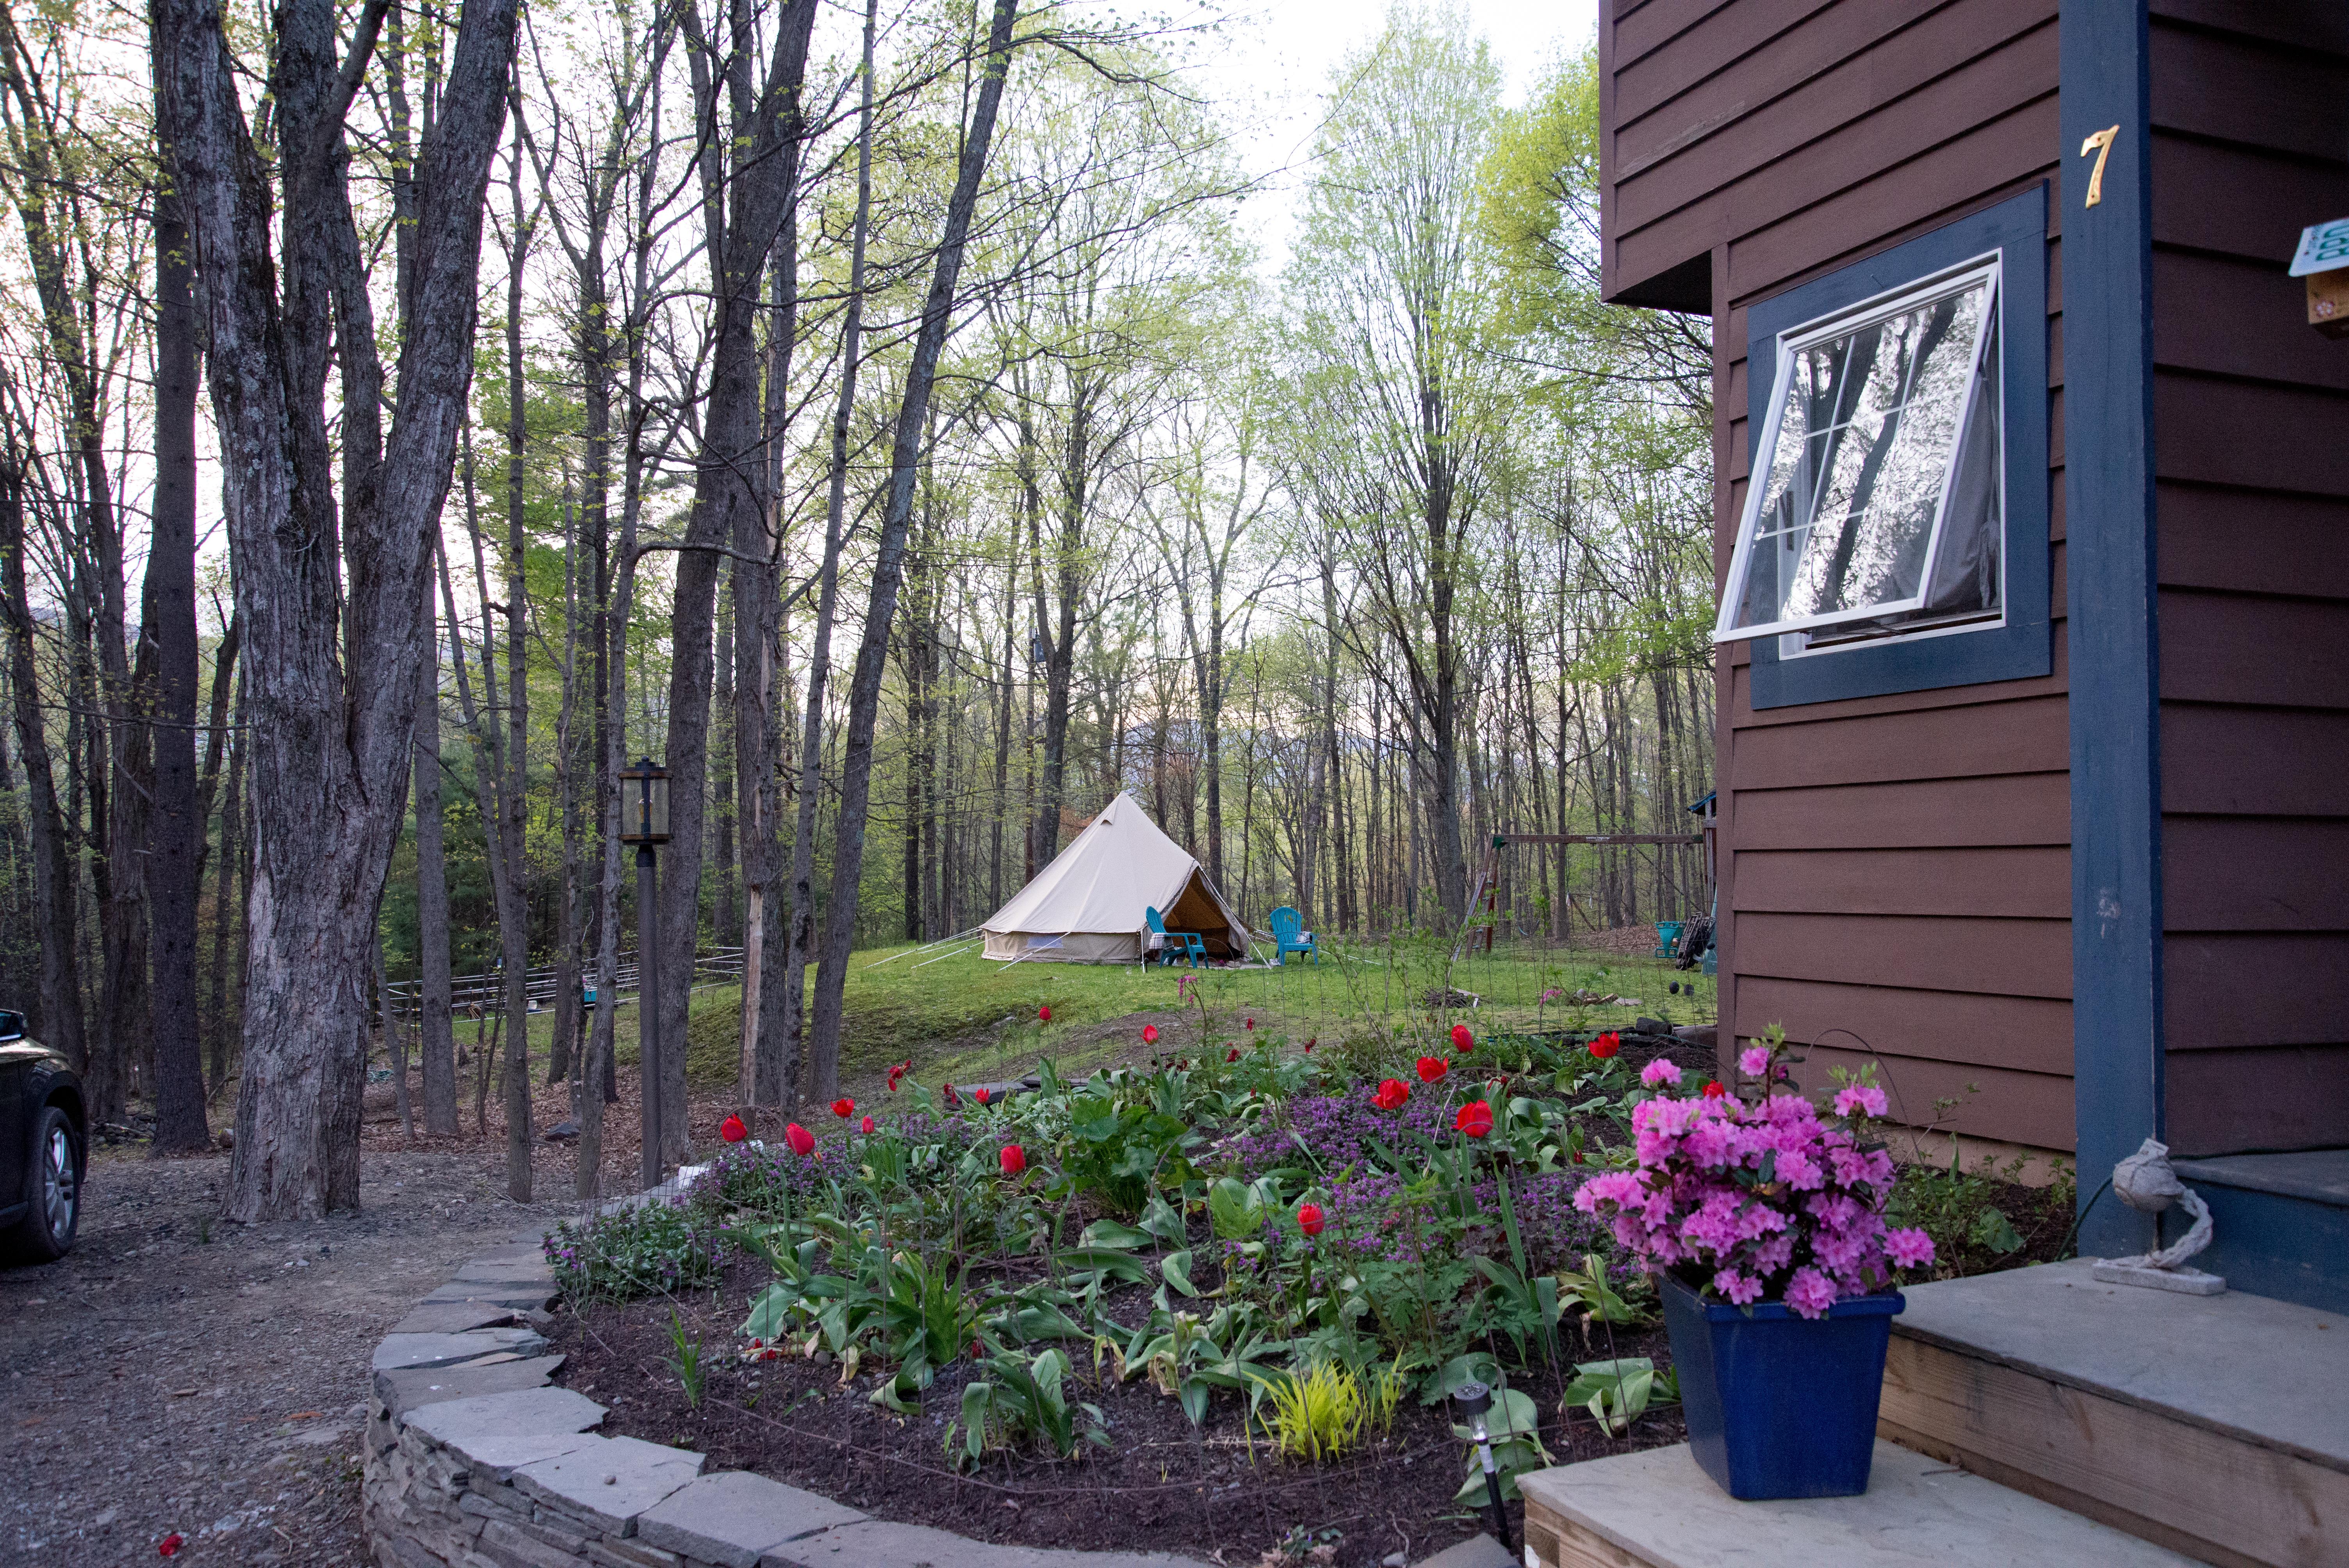 GStar pic house front garden w tent